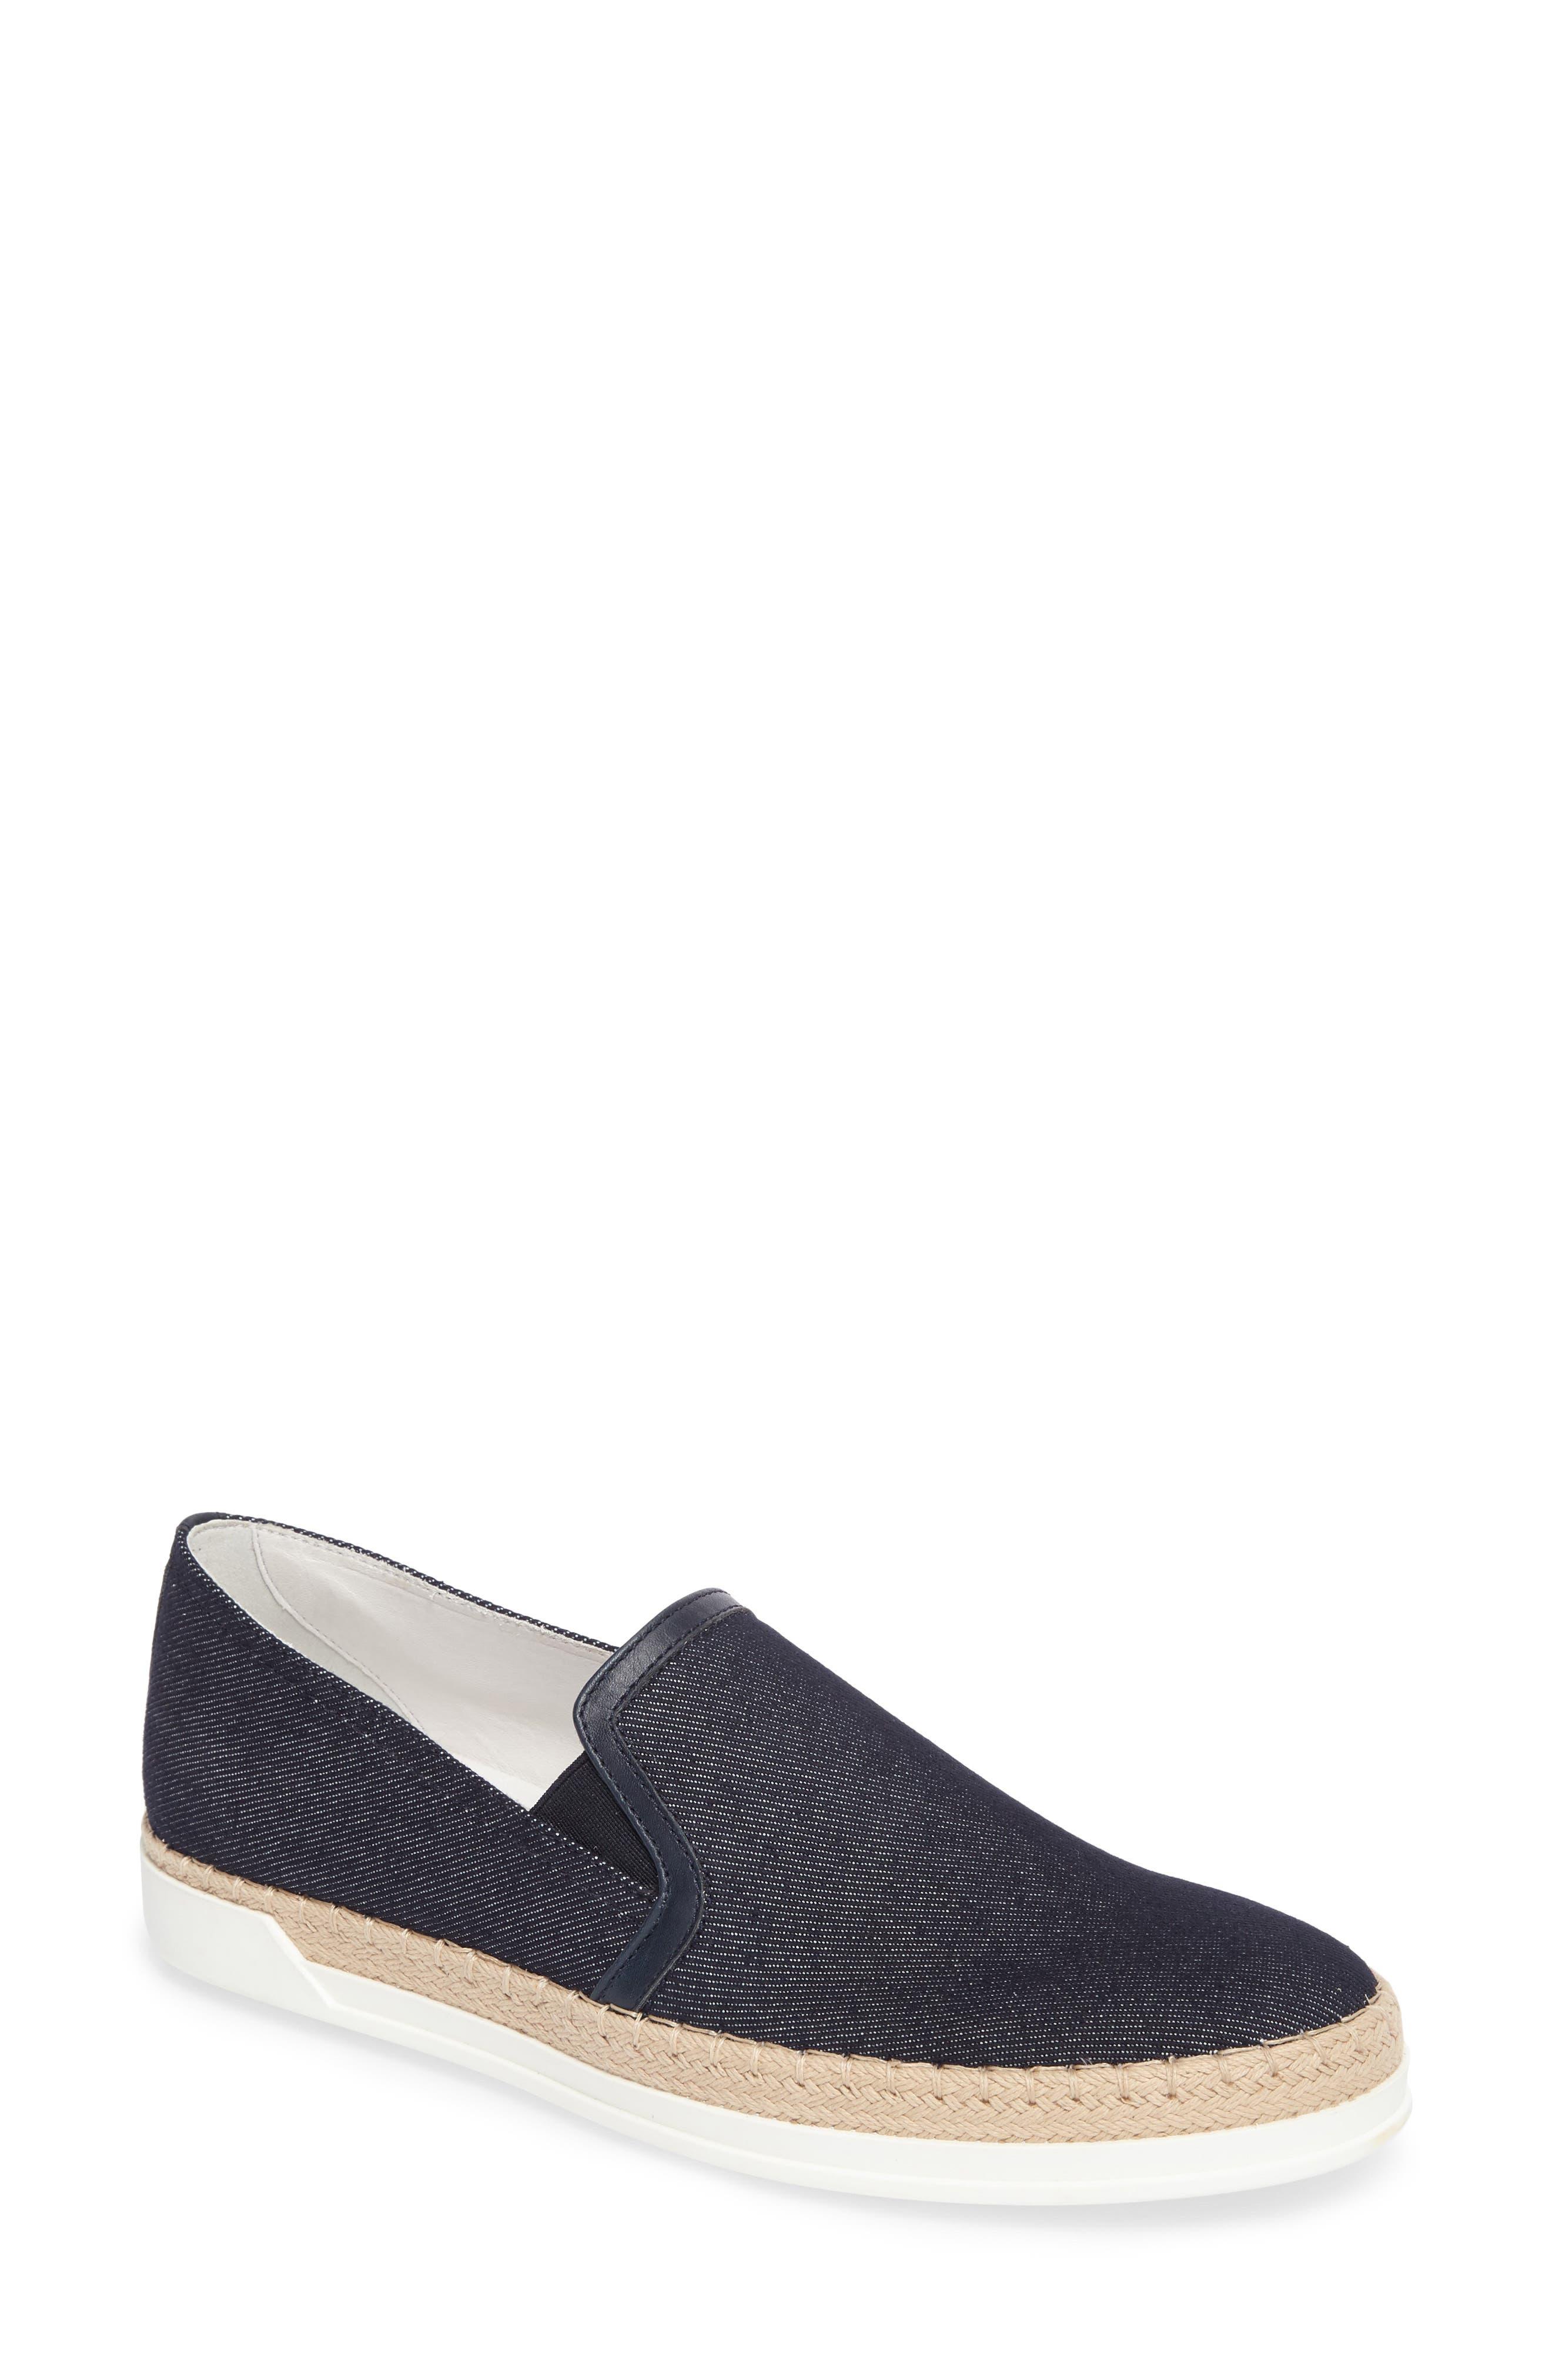 Espadrille Slip-On Sneaker,                         Main,                         color,